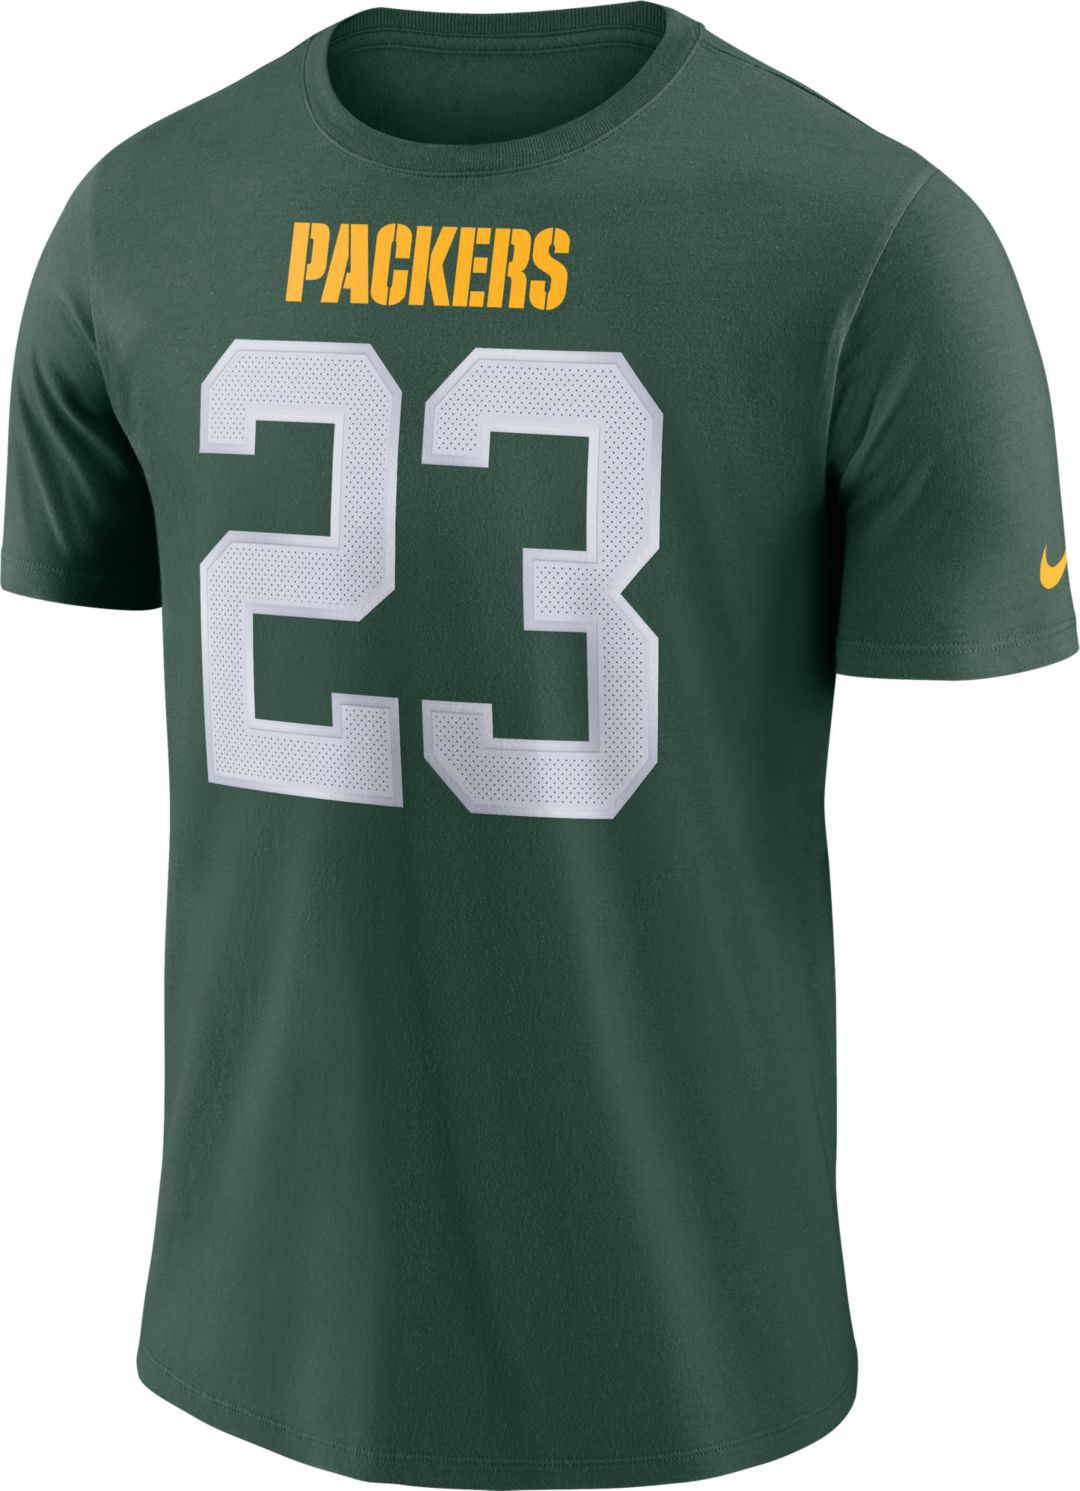 best cheap ac03c 5c14a Jaire Alexander #23 Nike Men's Green Bay Packers Pride Green T-Shirt